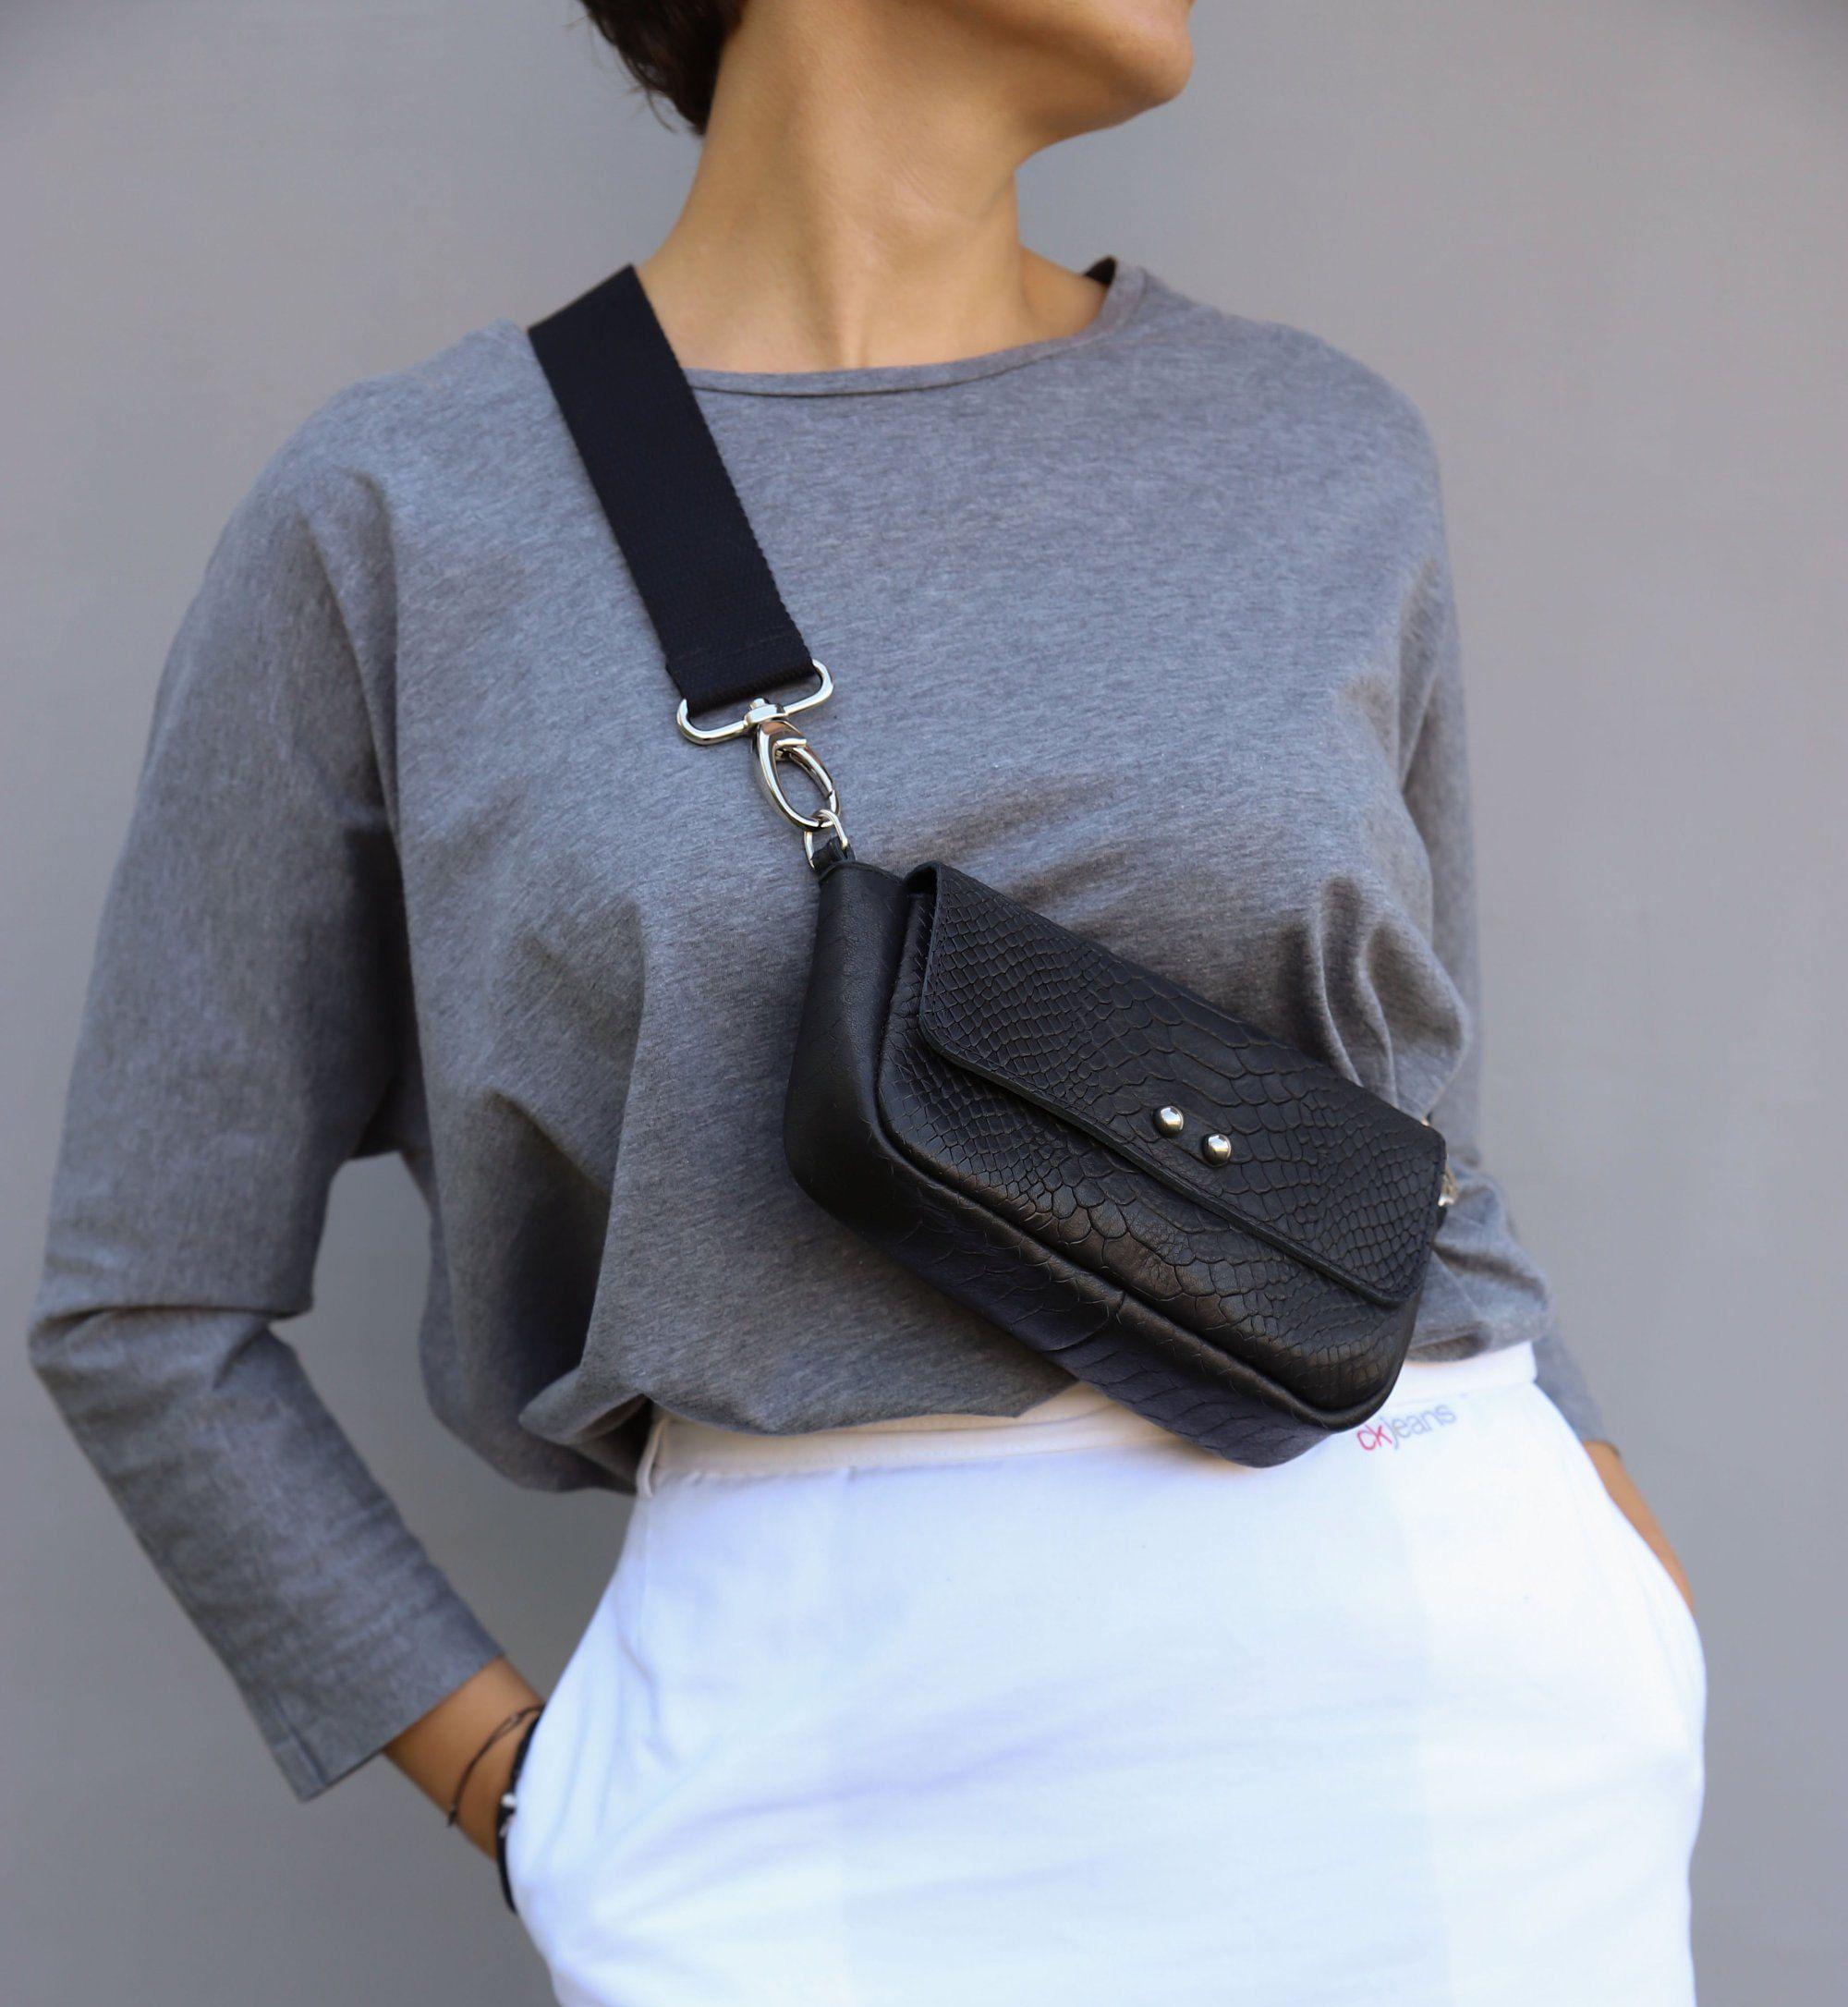 Customizable Convertible Bag 4 ways to wear waist bagshoulder bagcross-body bagwristlet bag-Festival bag-Messenger Bag-Tote Bag-HandBag